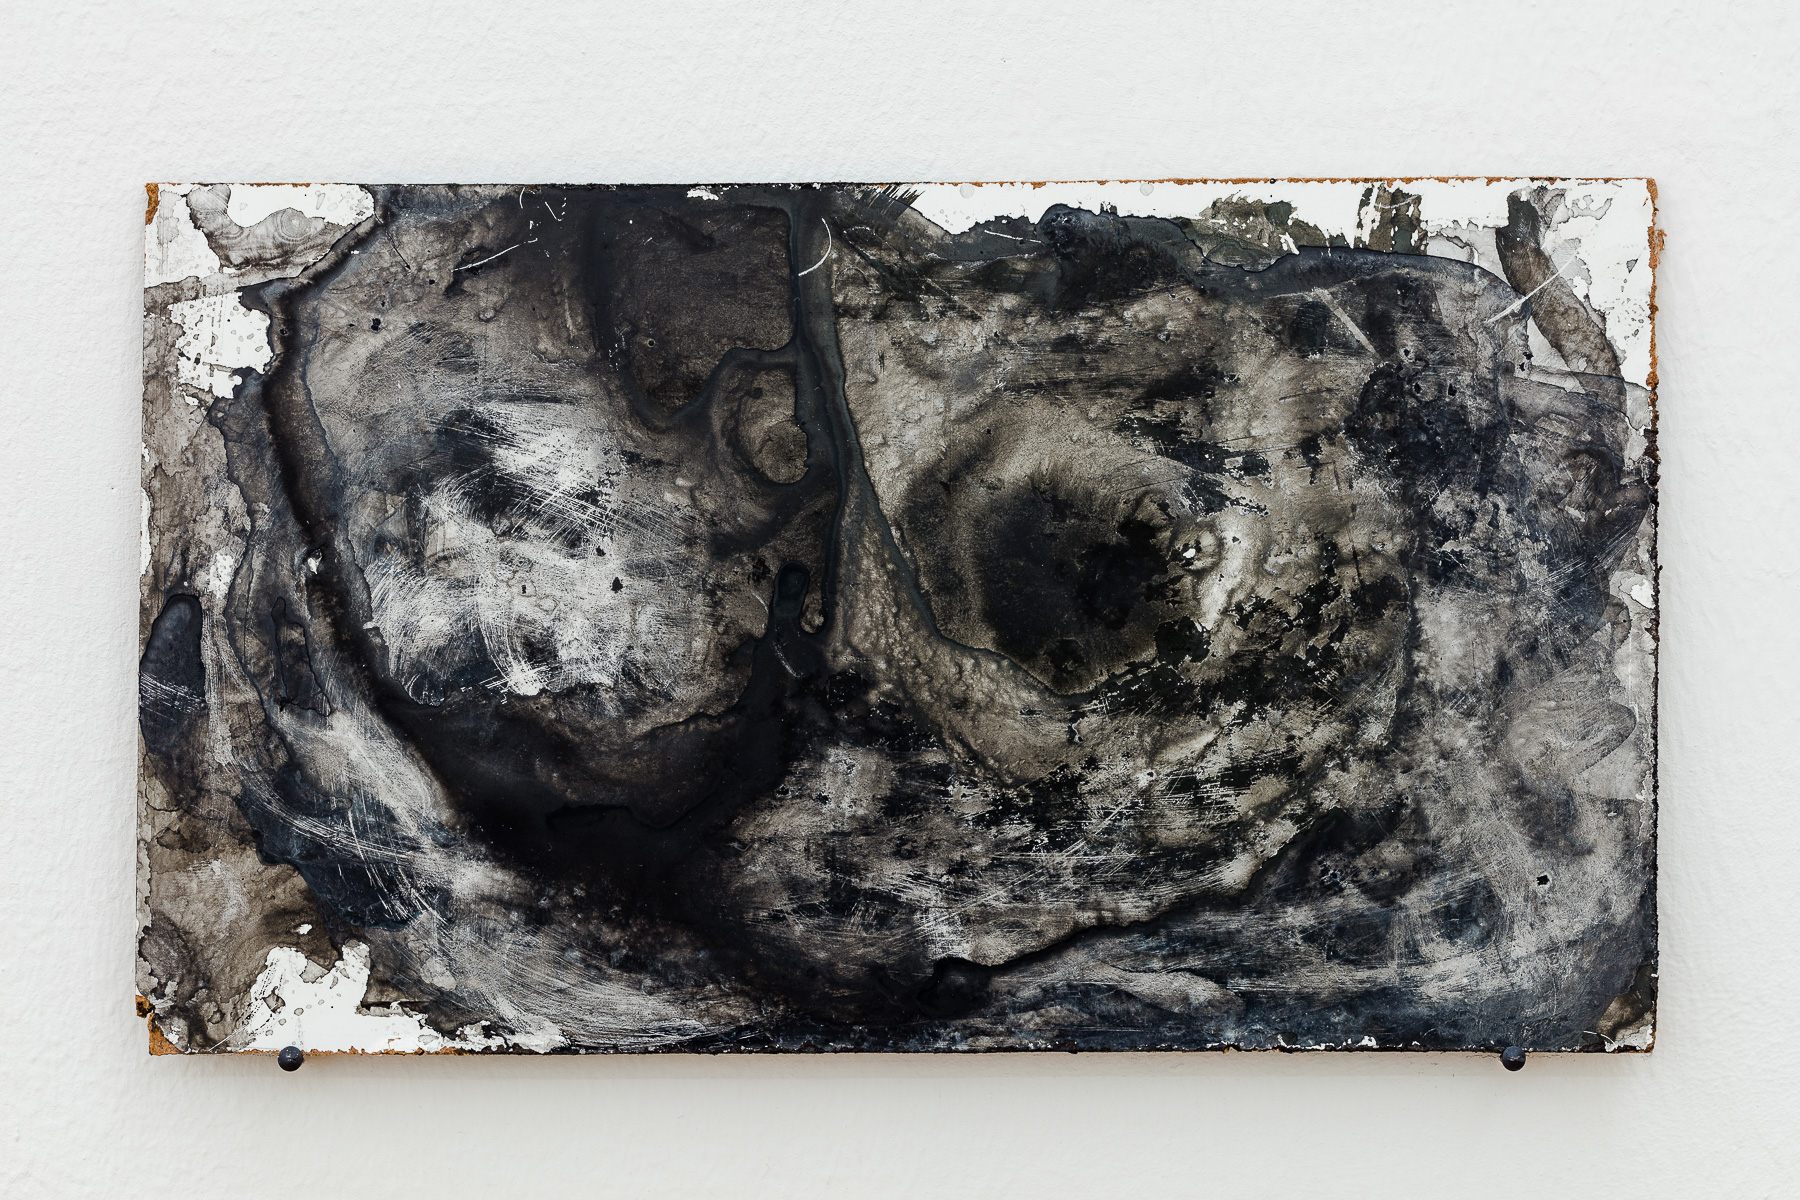 2019_05_20_Elke-Krystufek_Croy-Nielsen_by-kunst-dokumentation-com_002_web.jpg